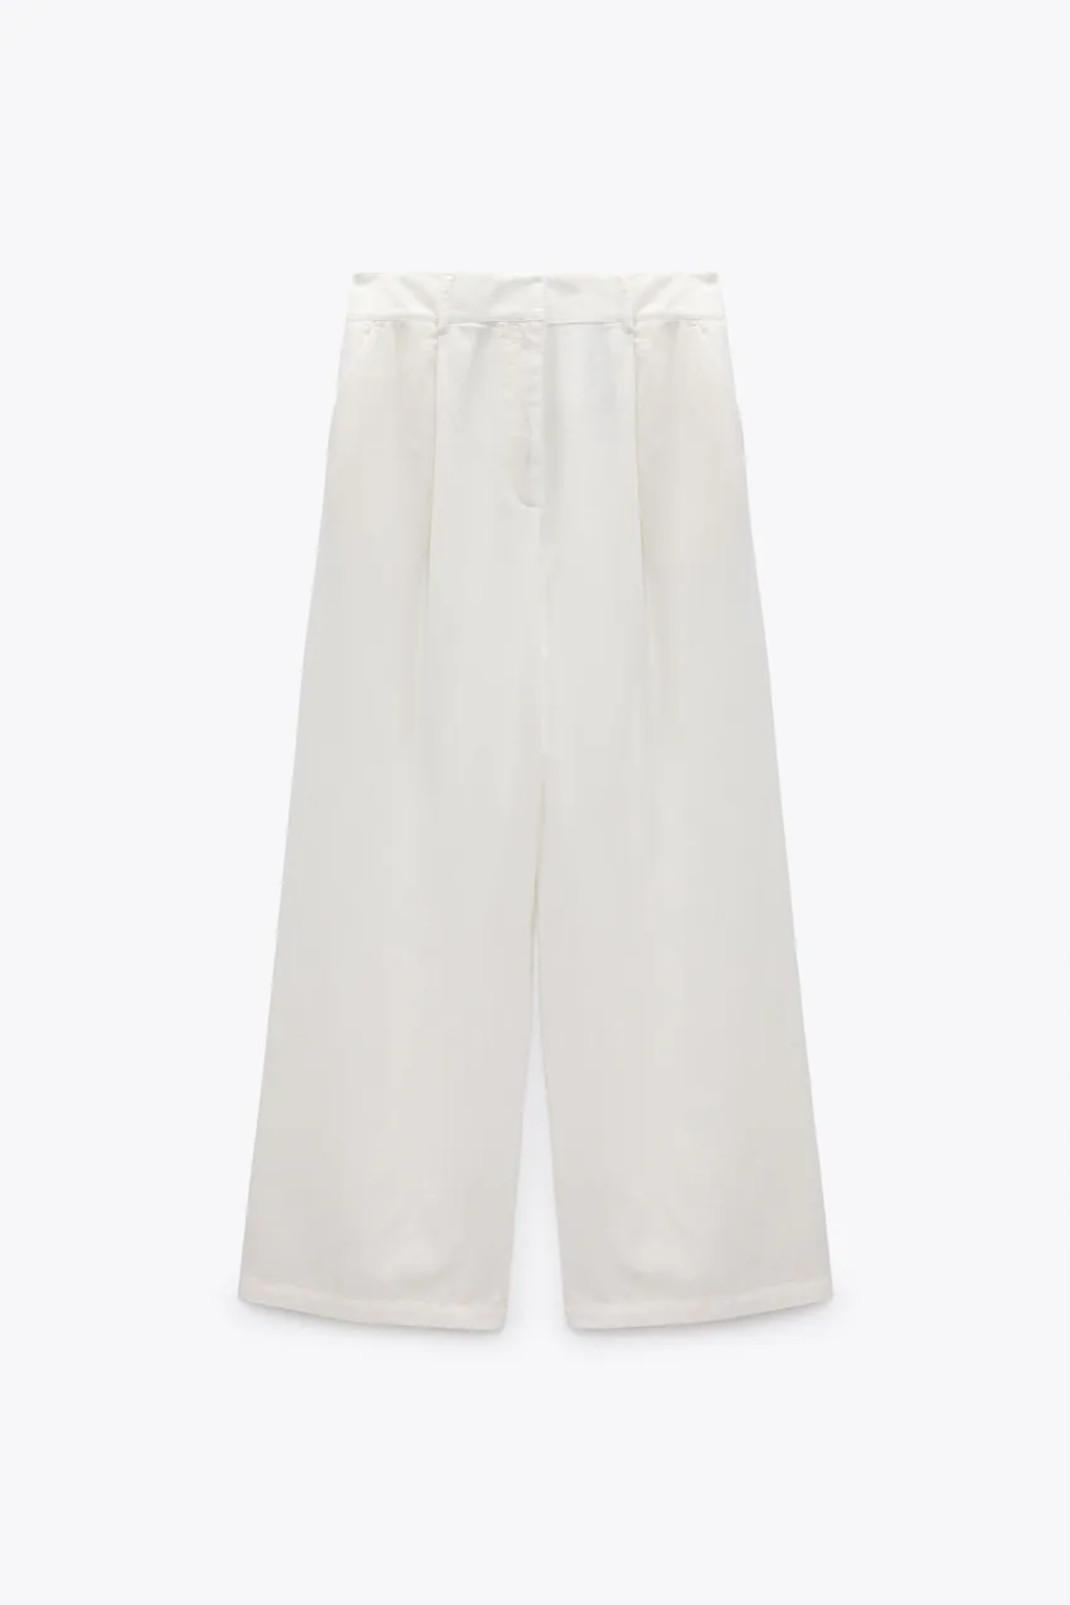 H εκρού ζιπ κιλότ από τα Zara που θα φορέσεις από τώρα μέχρι το φθινόπωρο